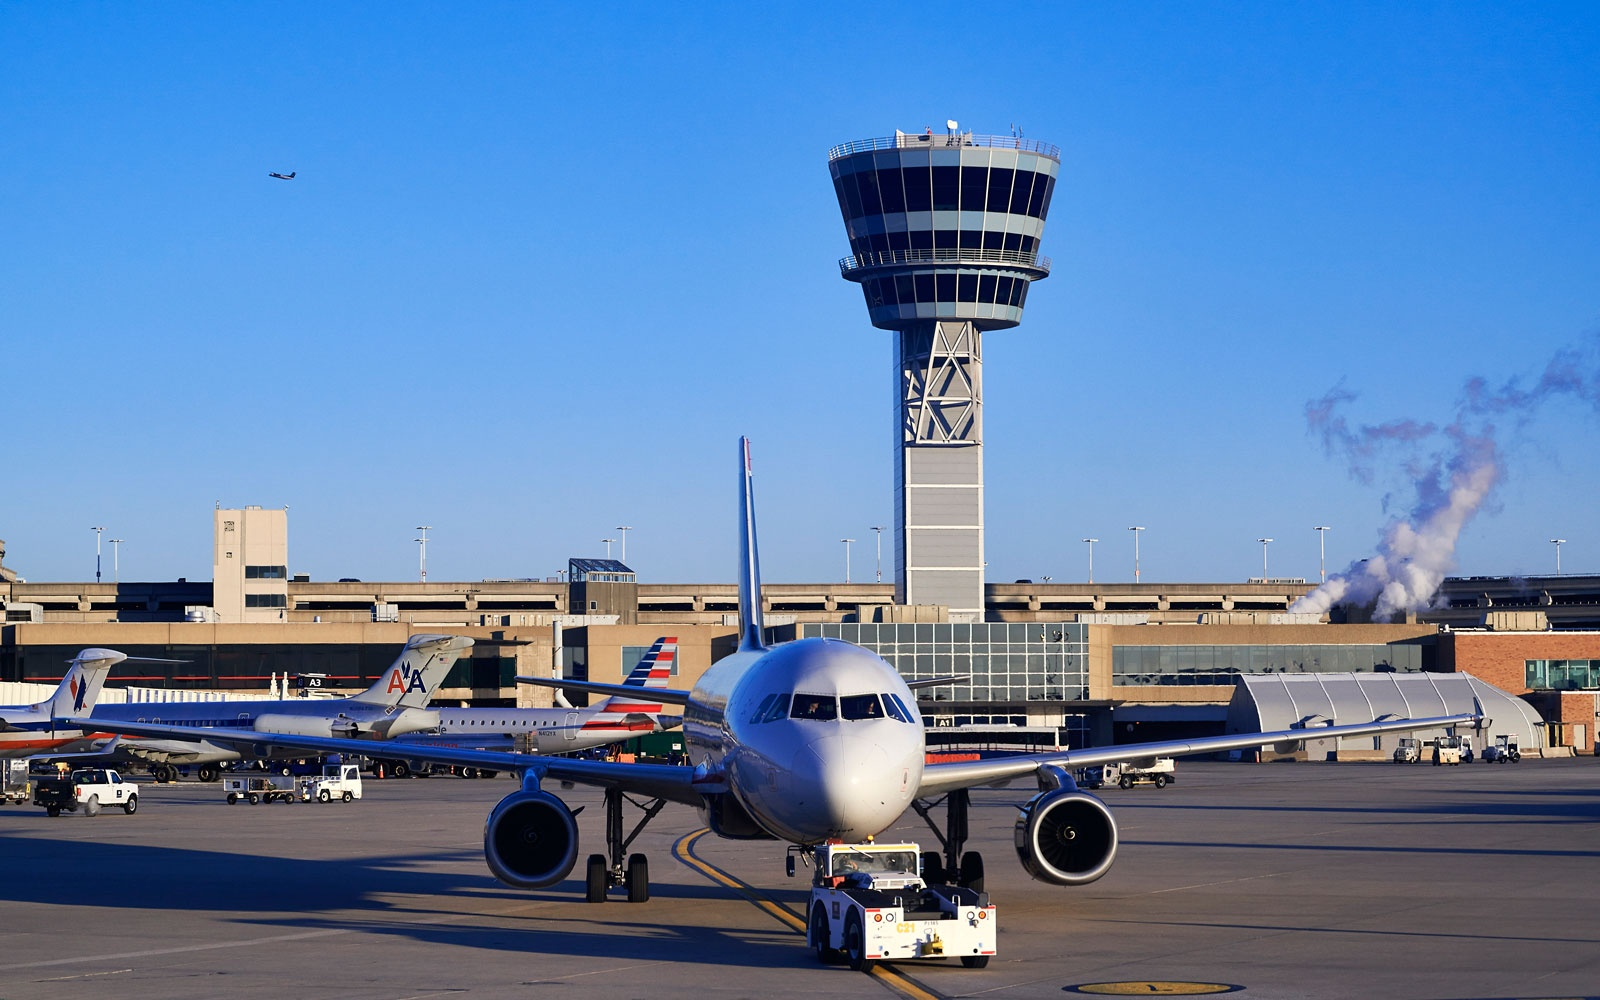 TheJomo Kenyatta International Airport is the biggest airport in Kenya.